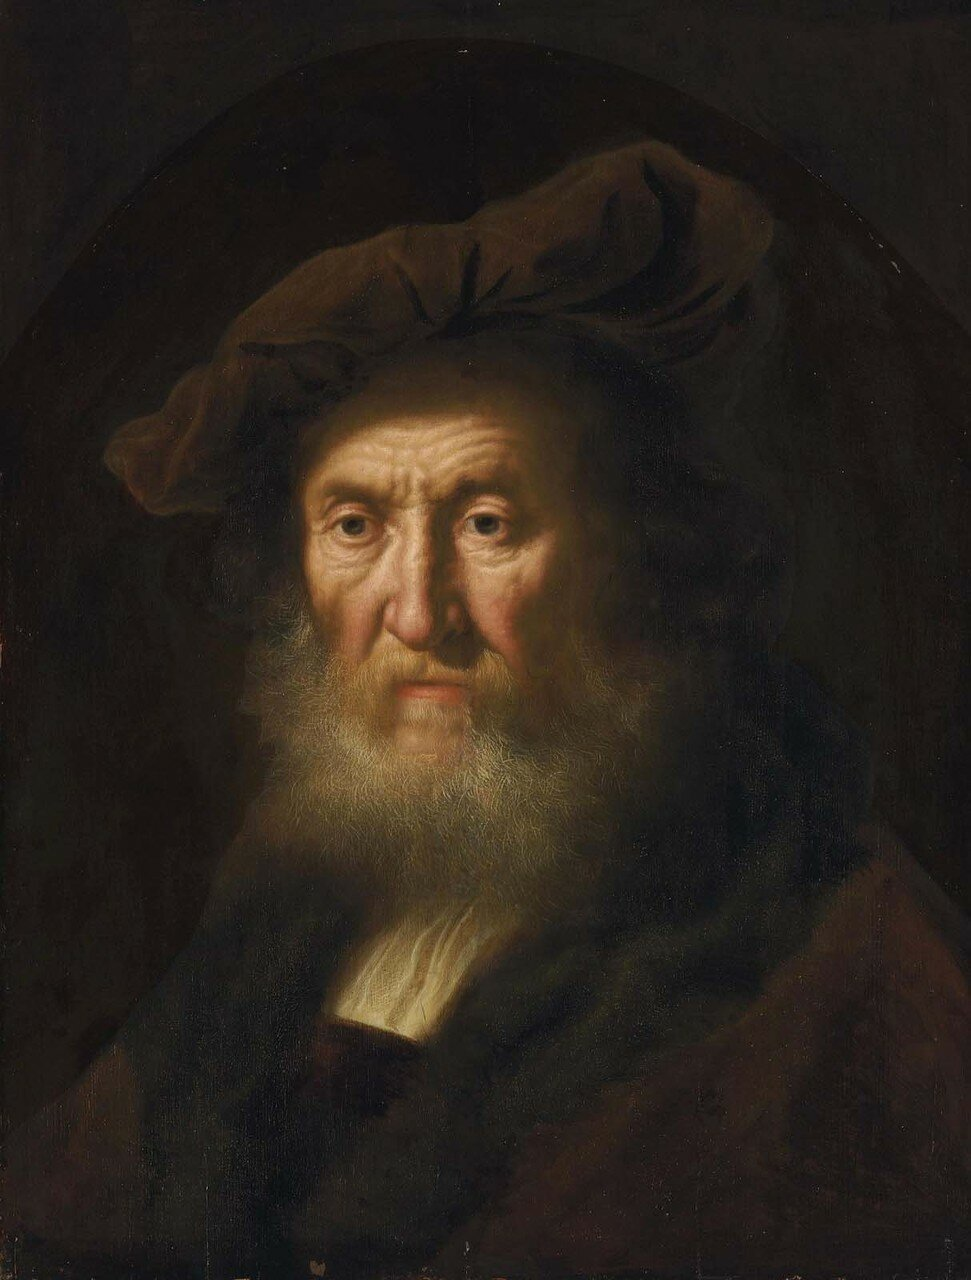 Голова пожилого мужчины (Head of an old man, bust-length)_61 х 47_д.,м._Частное собрание.jpg